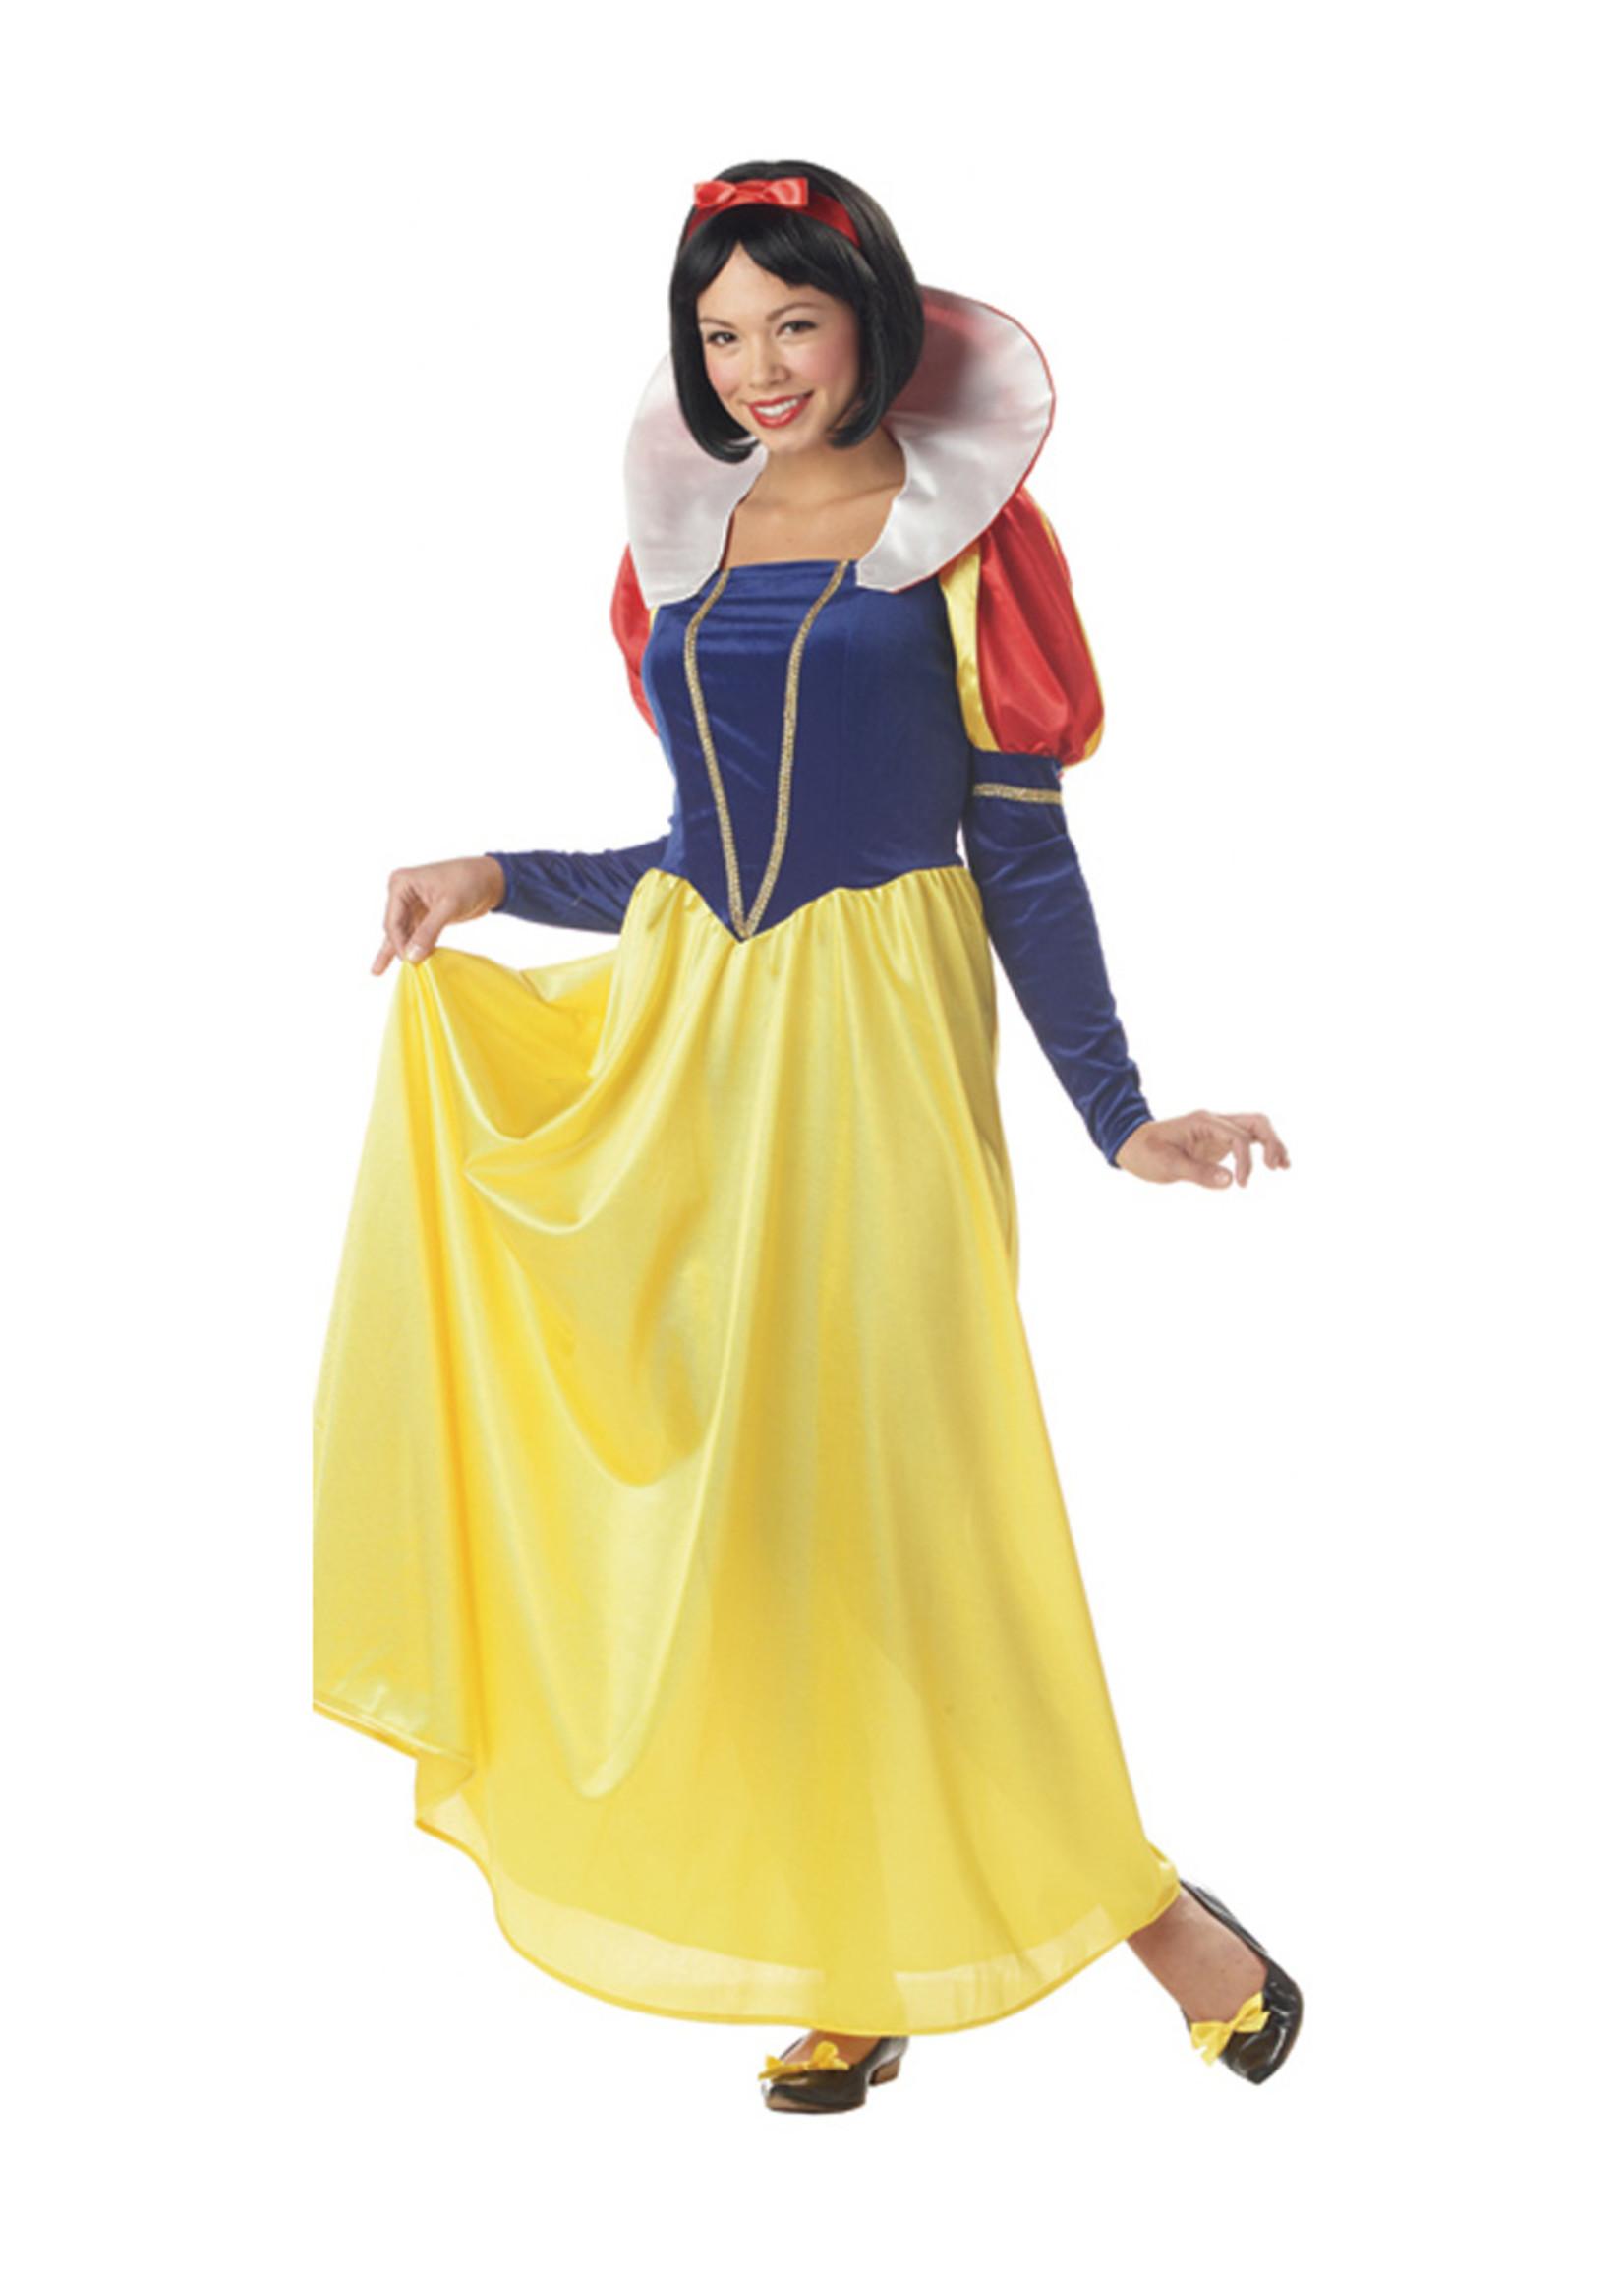 Snow White Costume - Women's